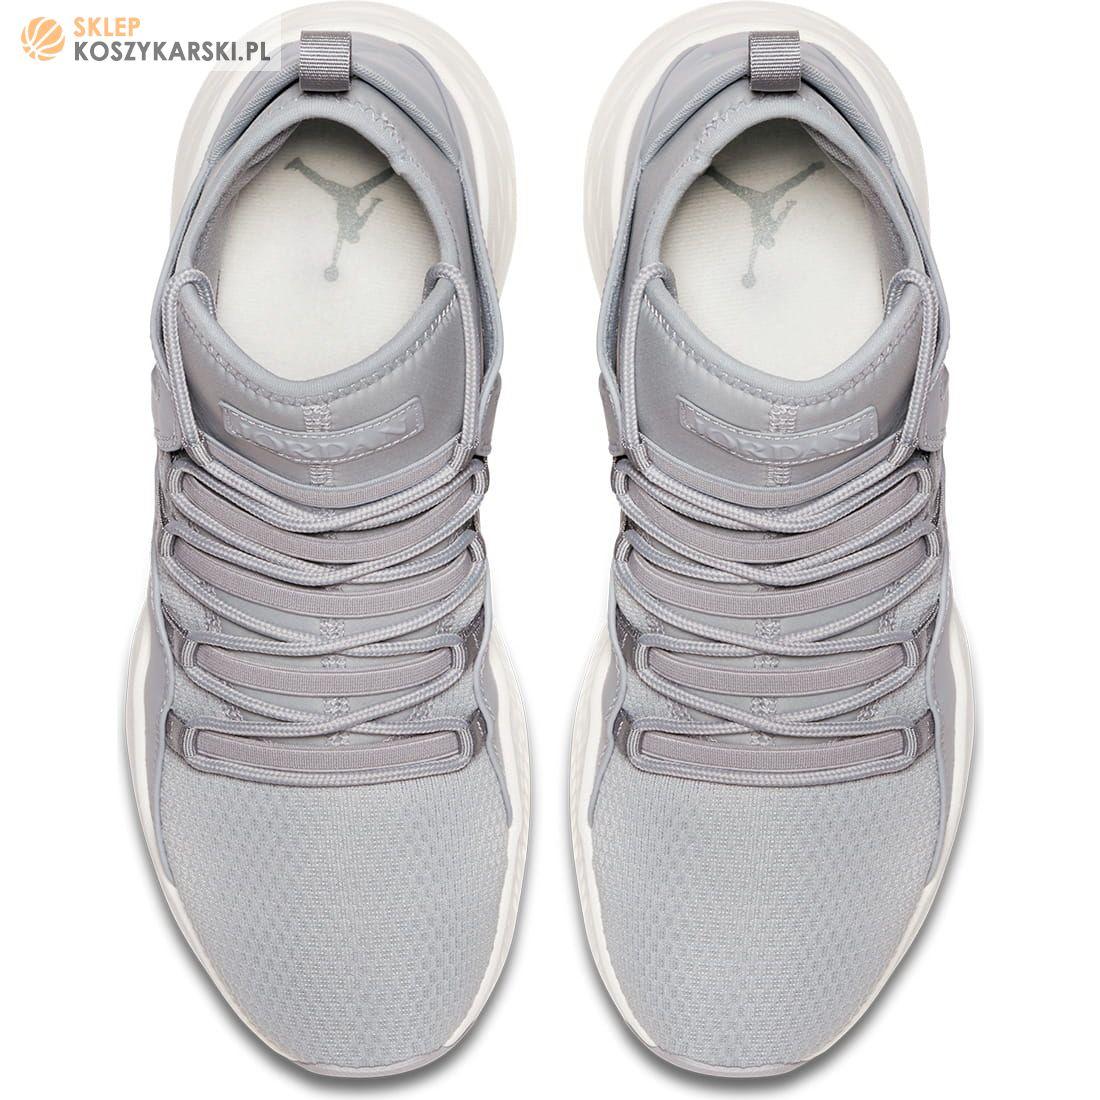 Buty koszykarskie Jordan Formula 23 Grey (881465 024)